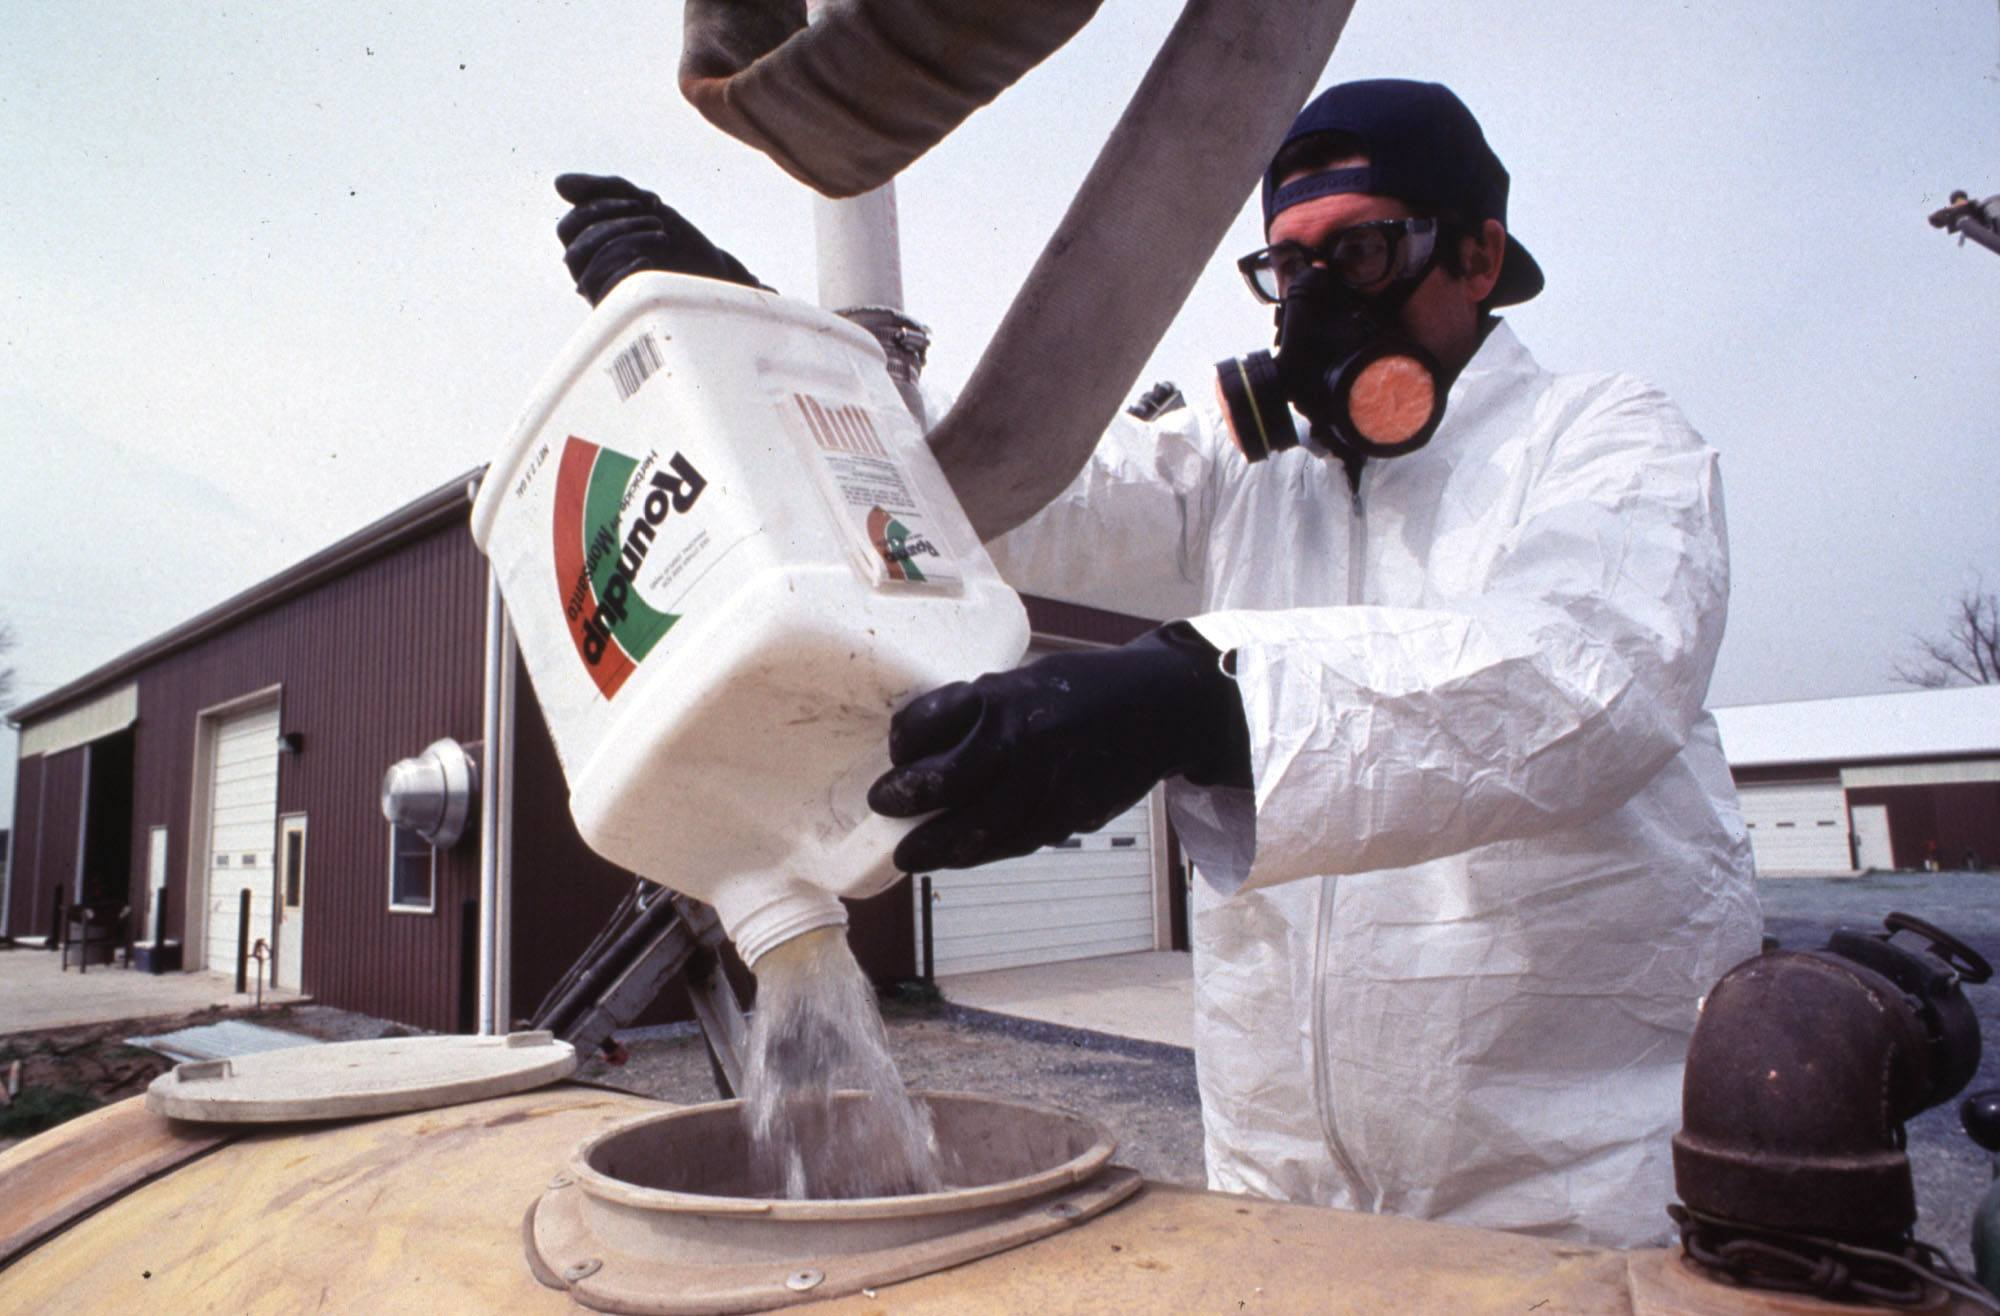 A farm worker handles a common pesticide